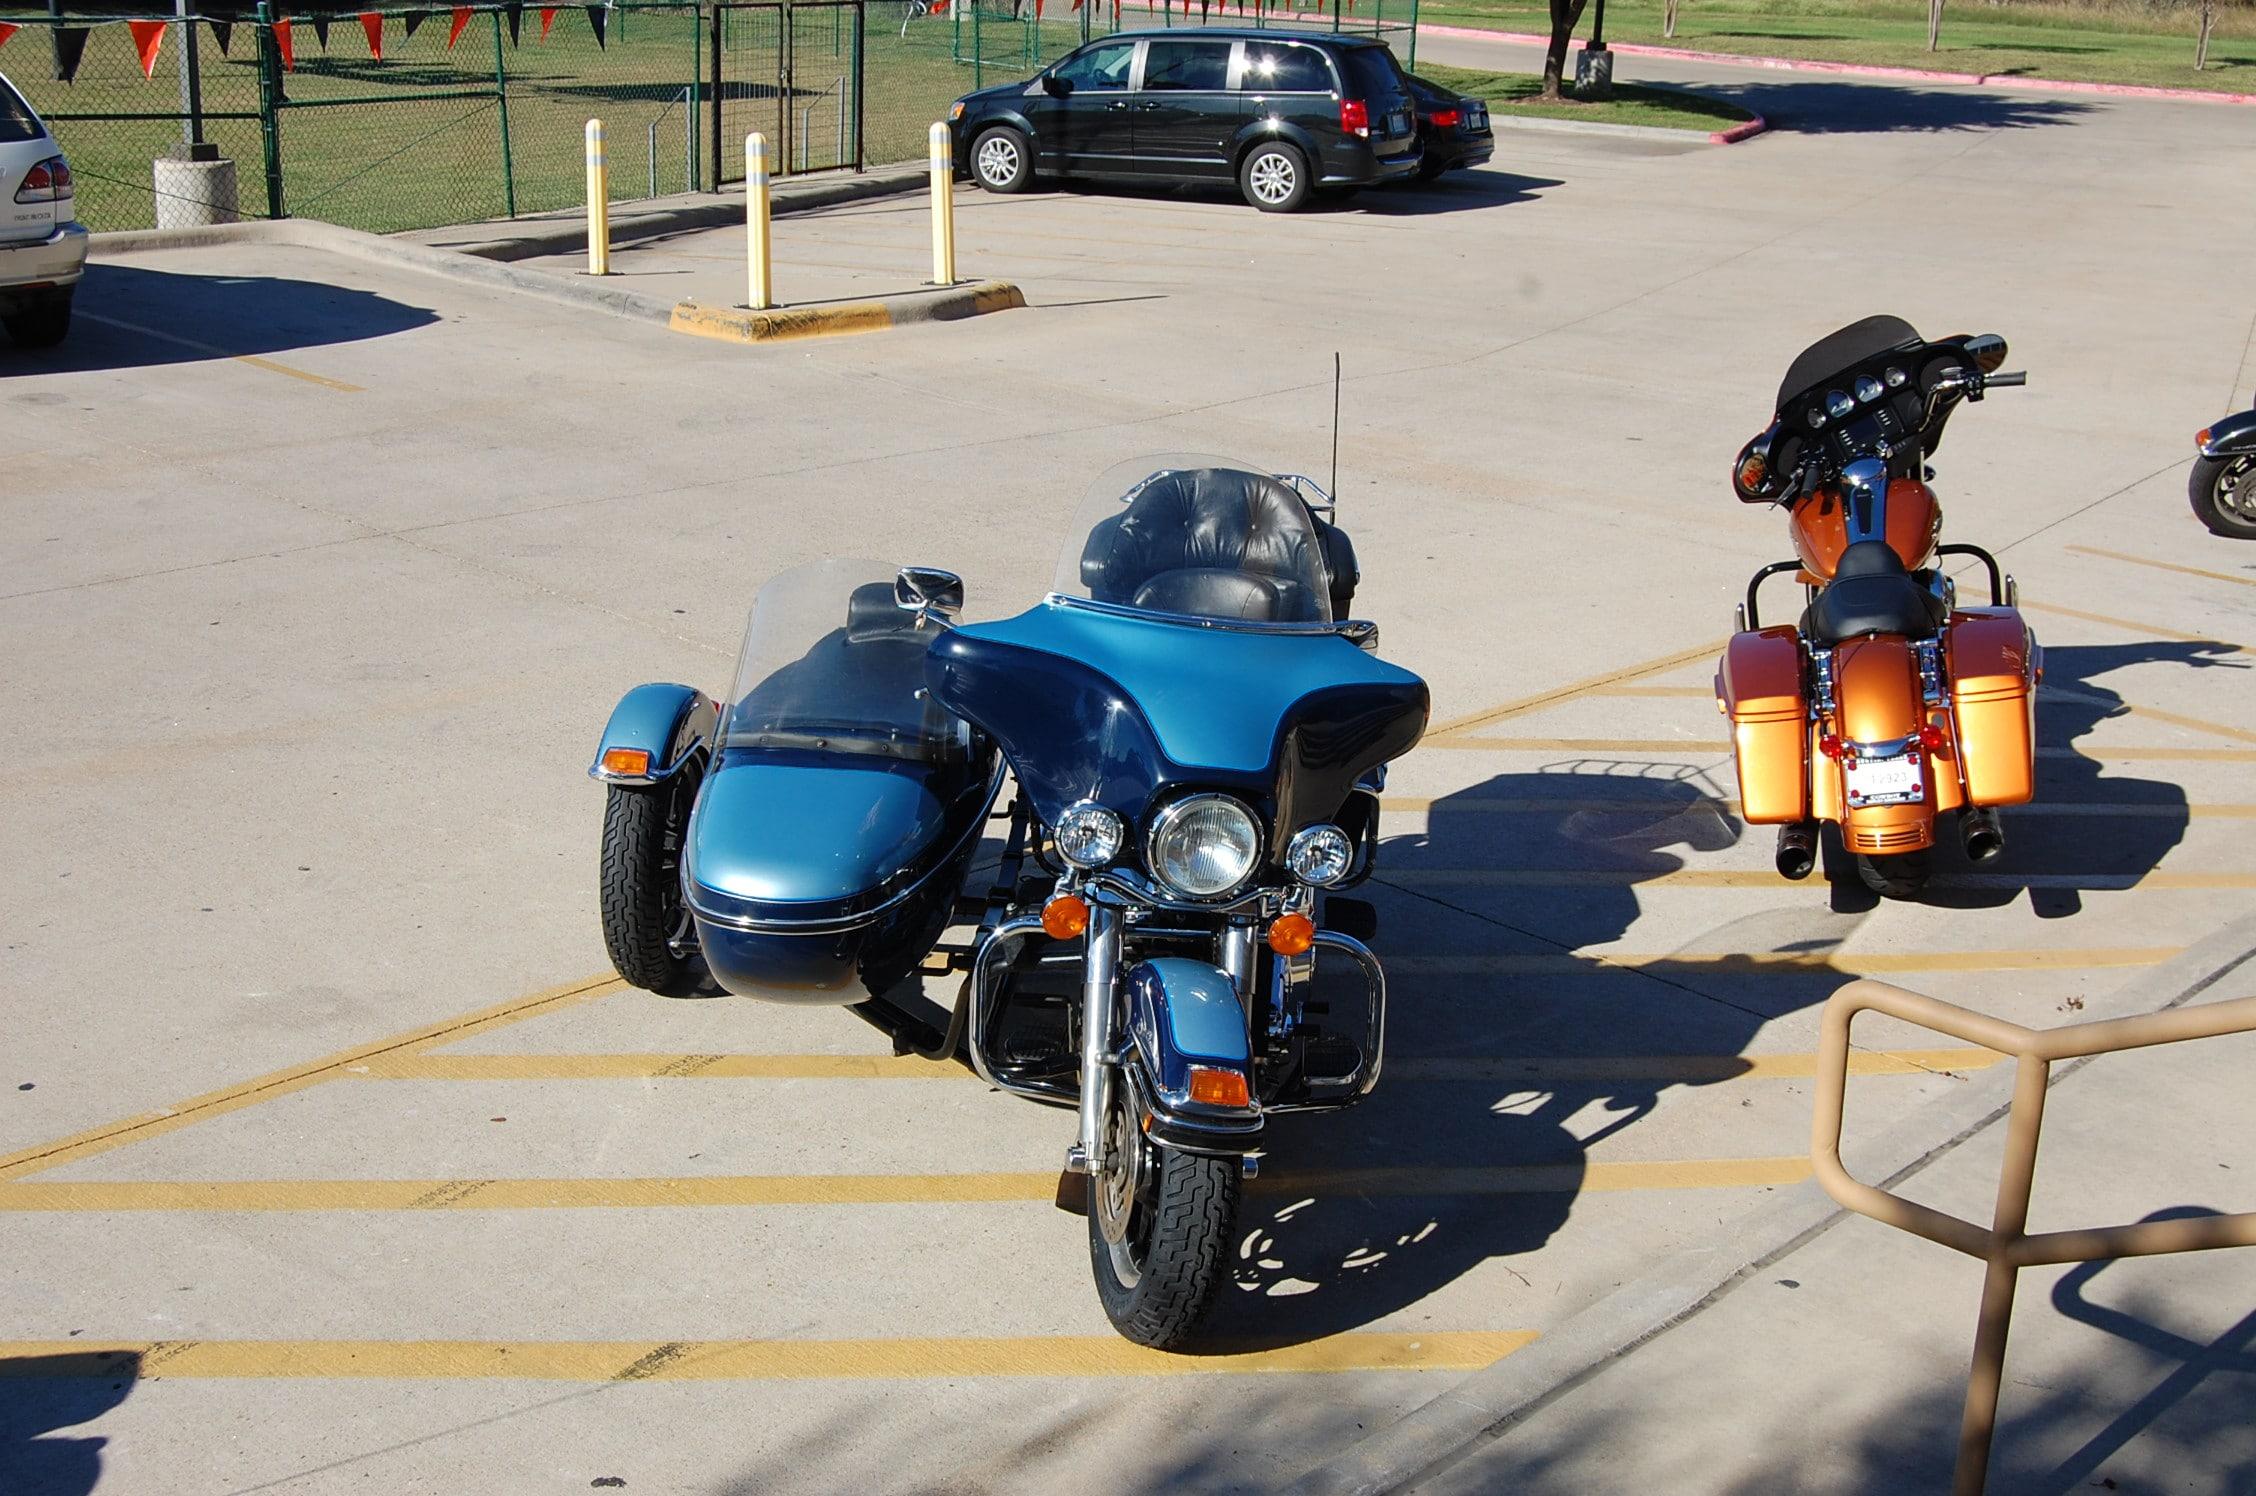 Harley Davidson F 250 For Sale Houston Tx | Autos Post